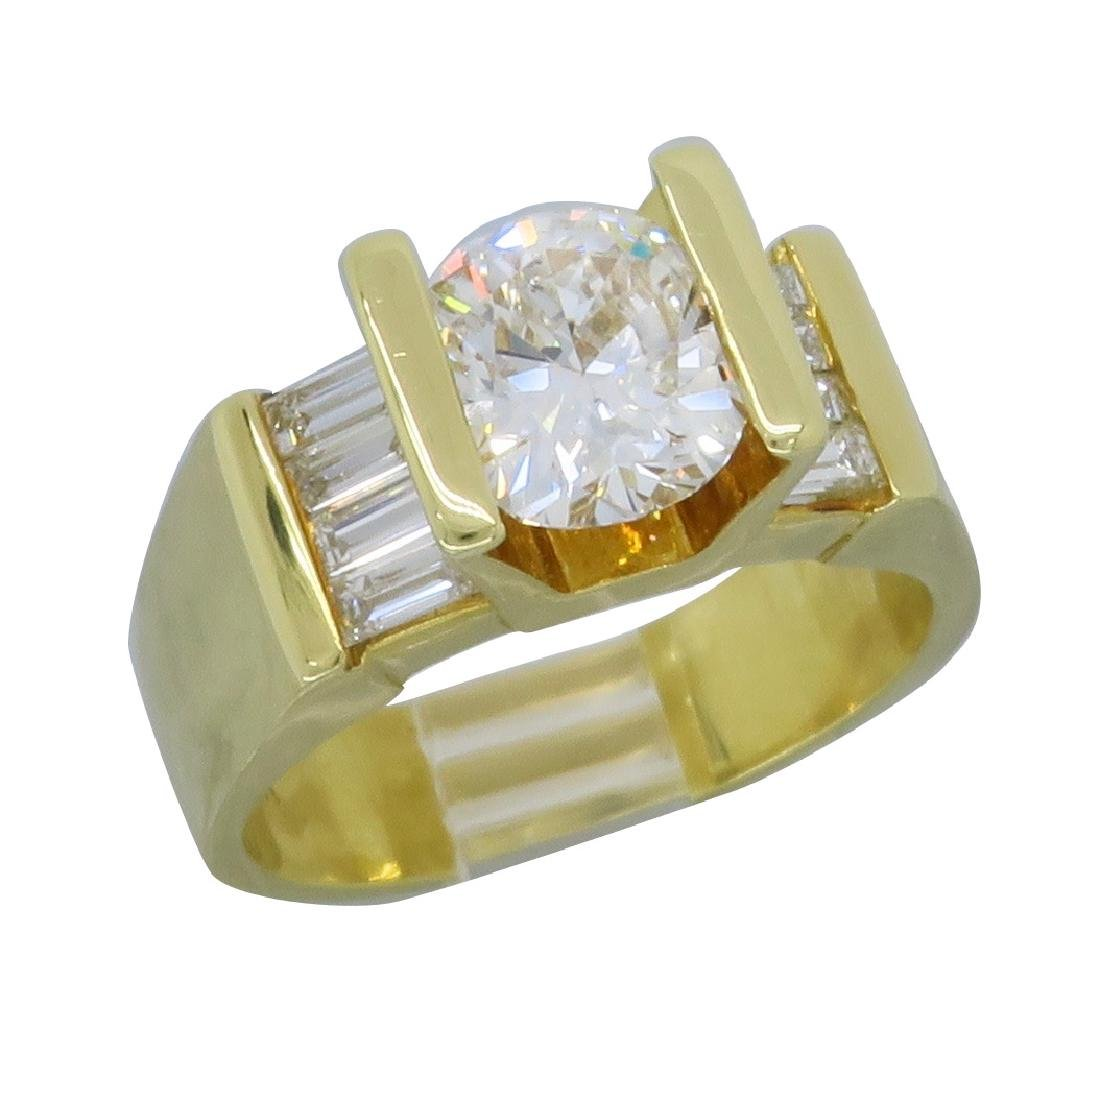 18KT Yellow Gold 2.01ctw Diamond Ring - 3